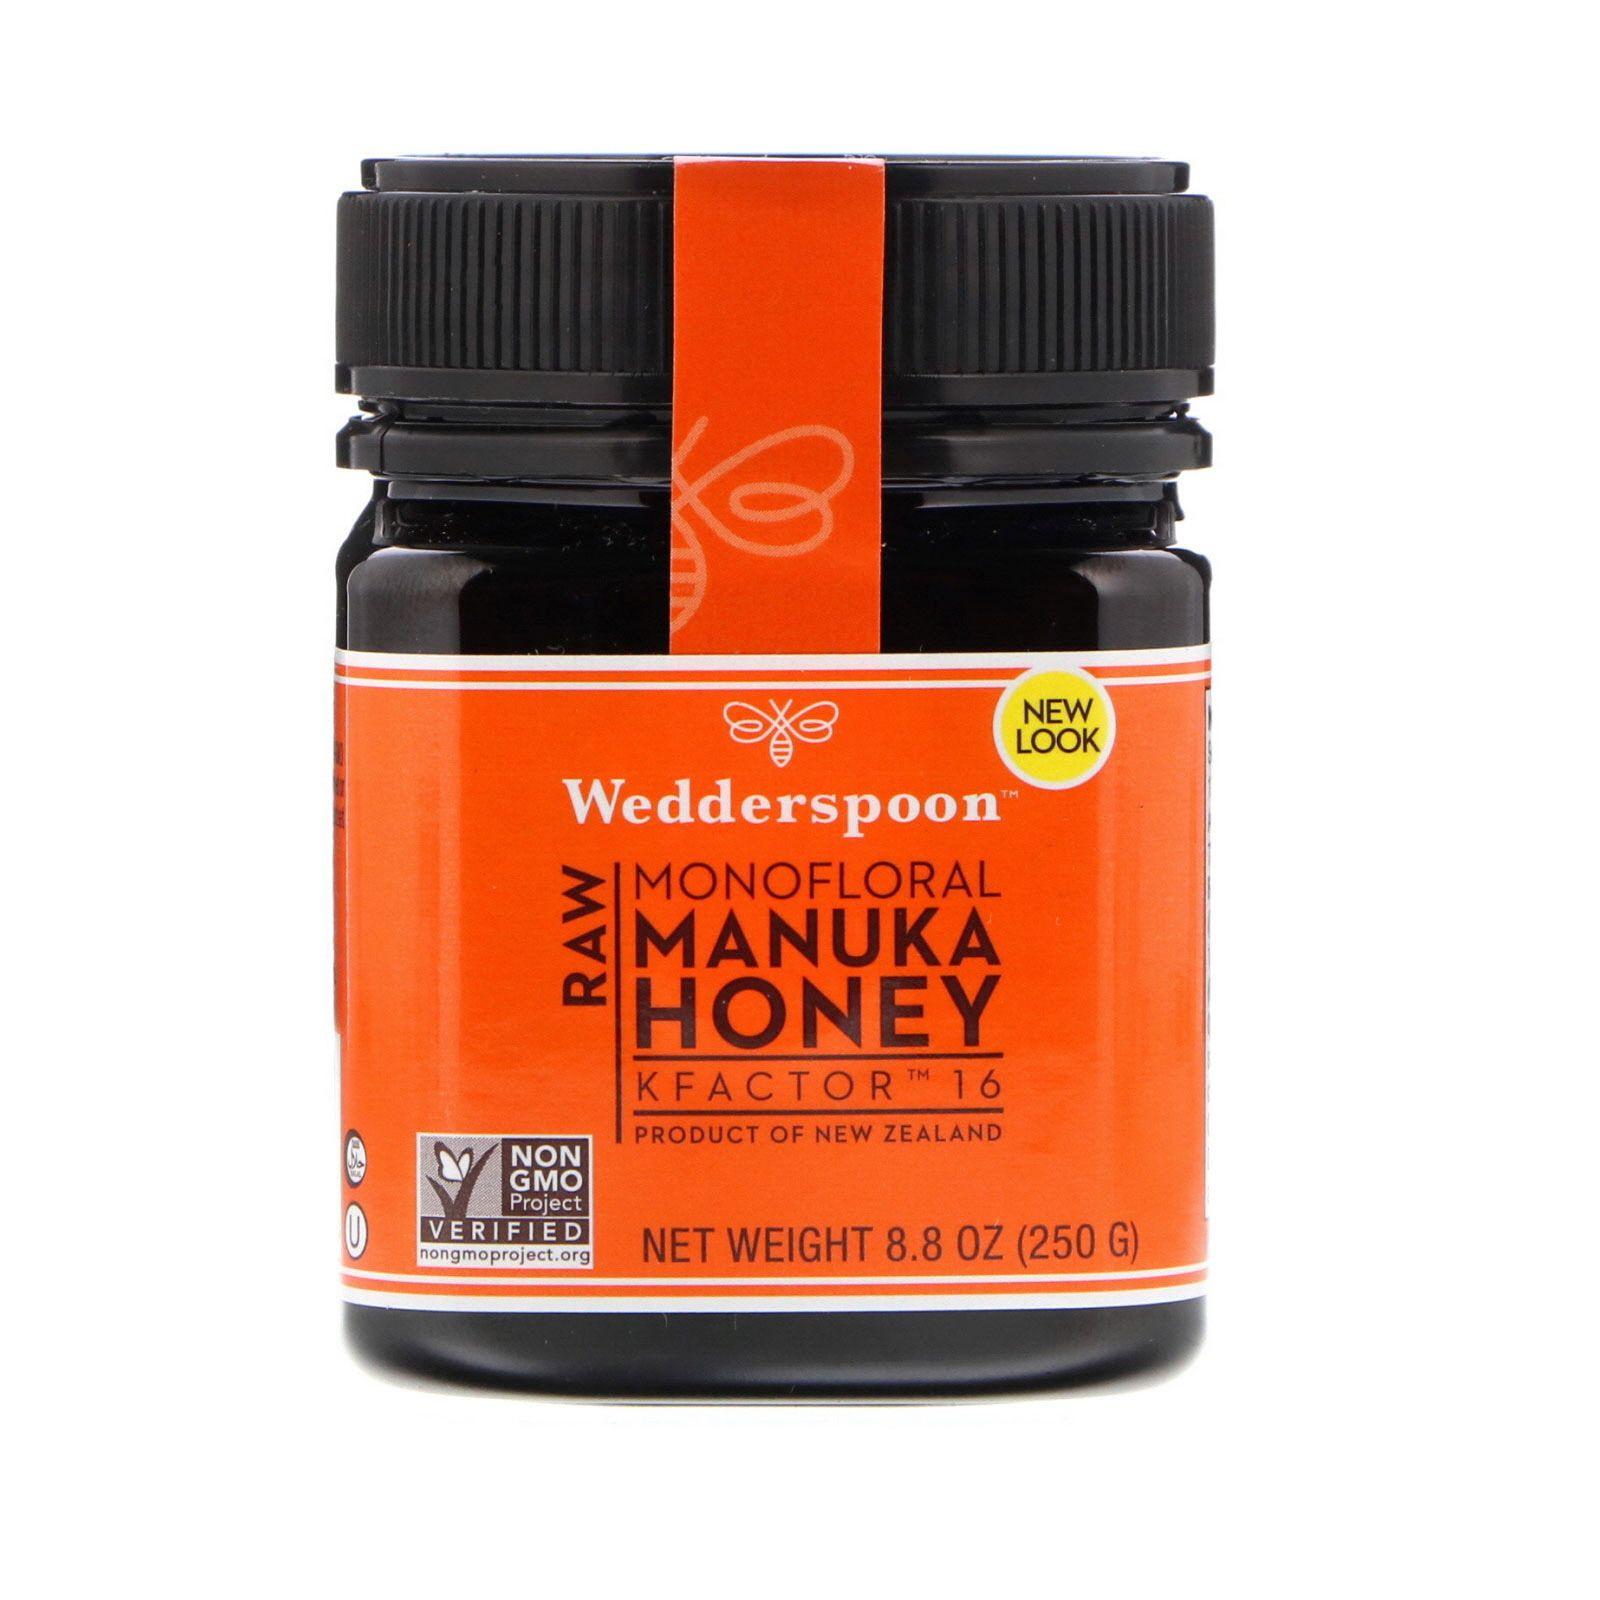 Wedderspoon Raw Monofloral Manuka Honey Kfactor 16 8 8 Oz 250 G Manuka Honey Raw Manuka Honey Organic Raw Honey